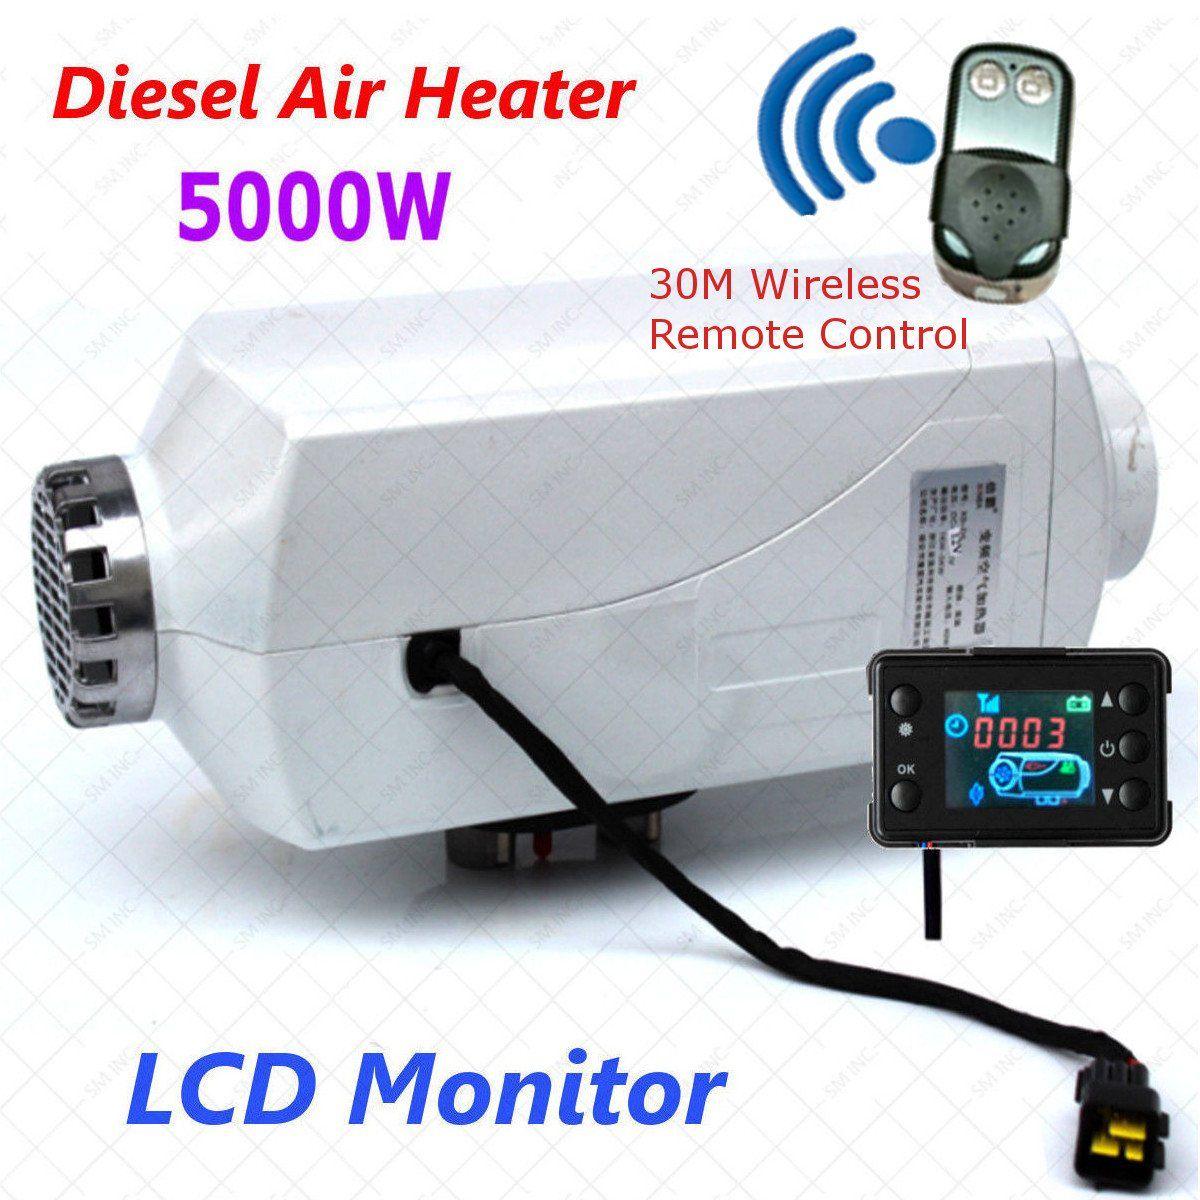 Hot 12V 5000W LCD Display Air diesel- Fuel Car Heater for trucks,boats,bus,Car Aluminum shell